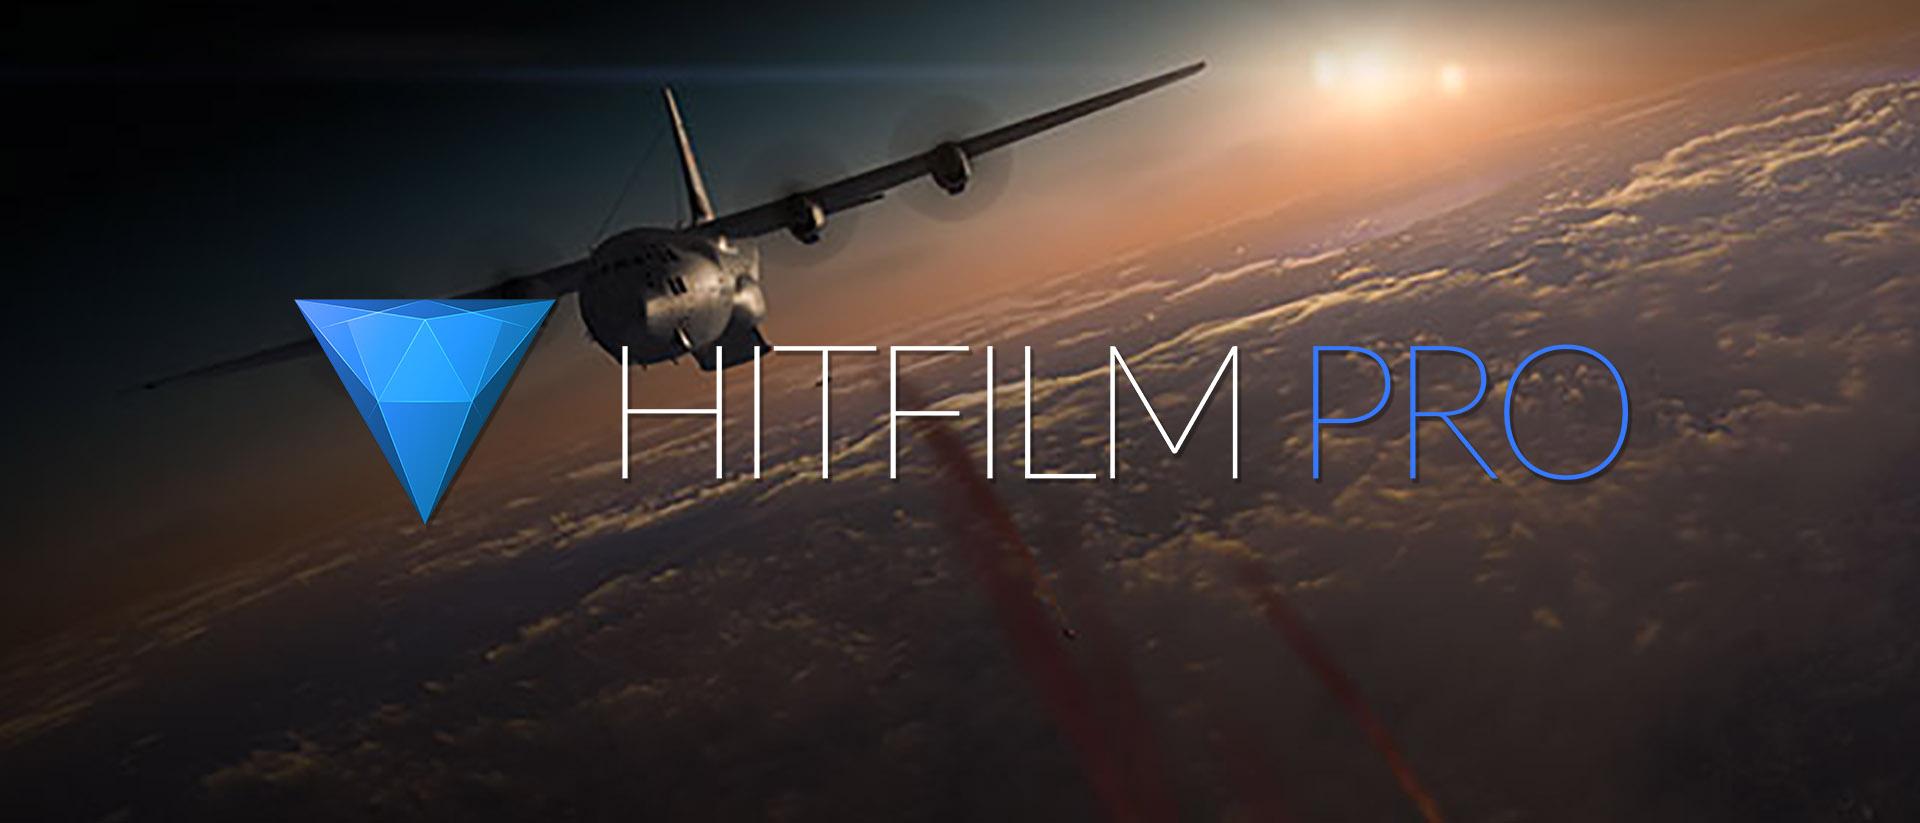 Hitfilm pro banner 2